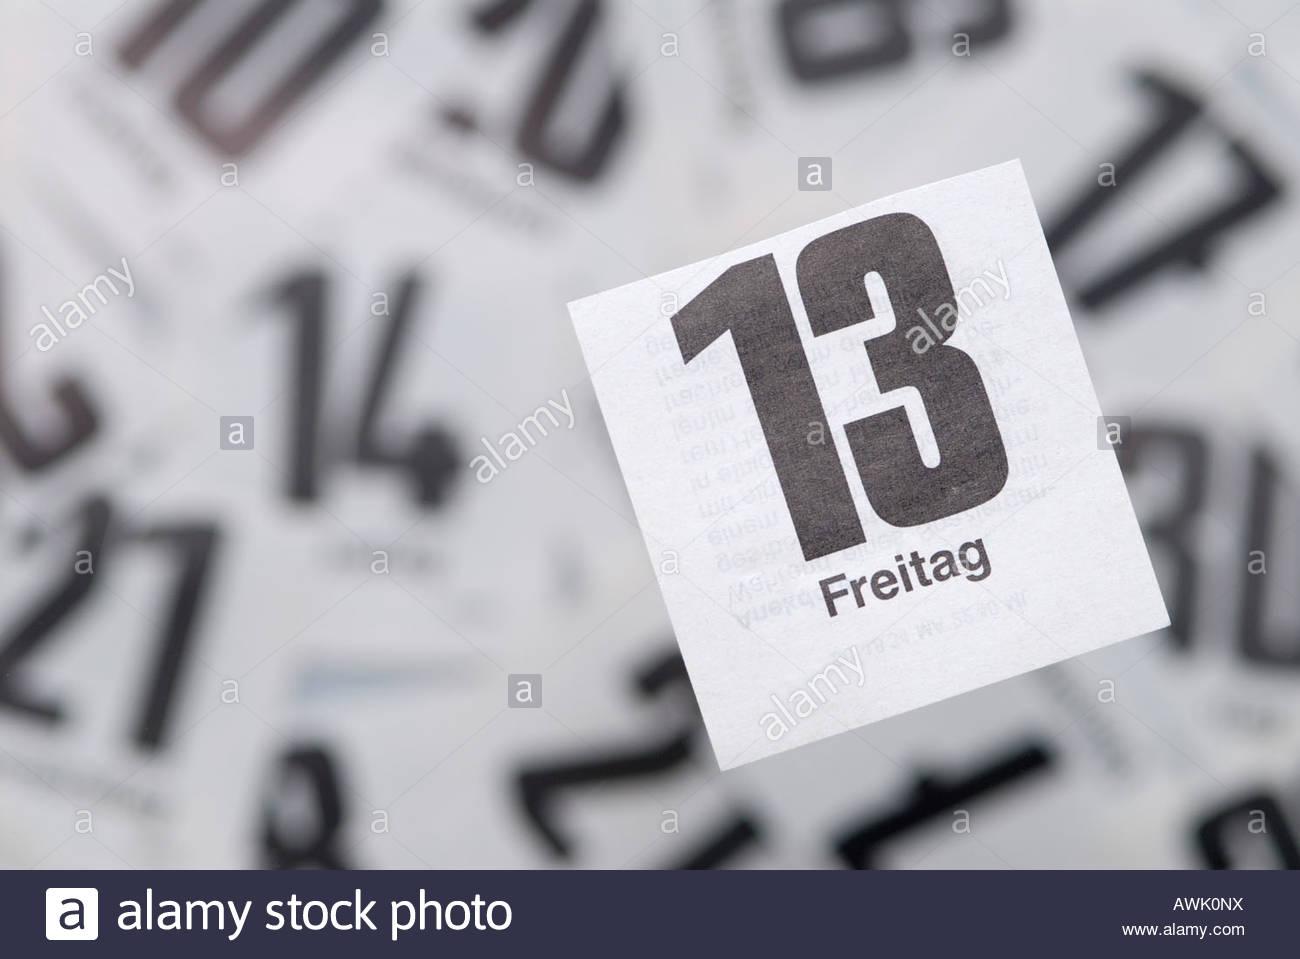 Aberglaube Unglück freitag der 13 13 dreizehnte dreizehn kalender kalenderblatt stock